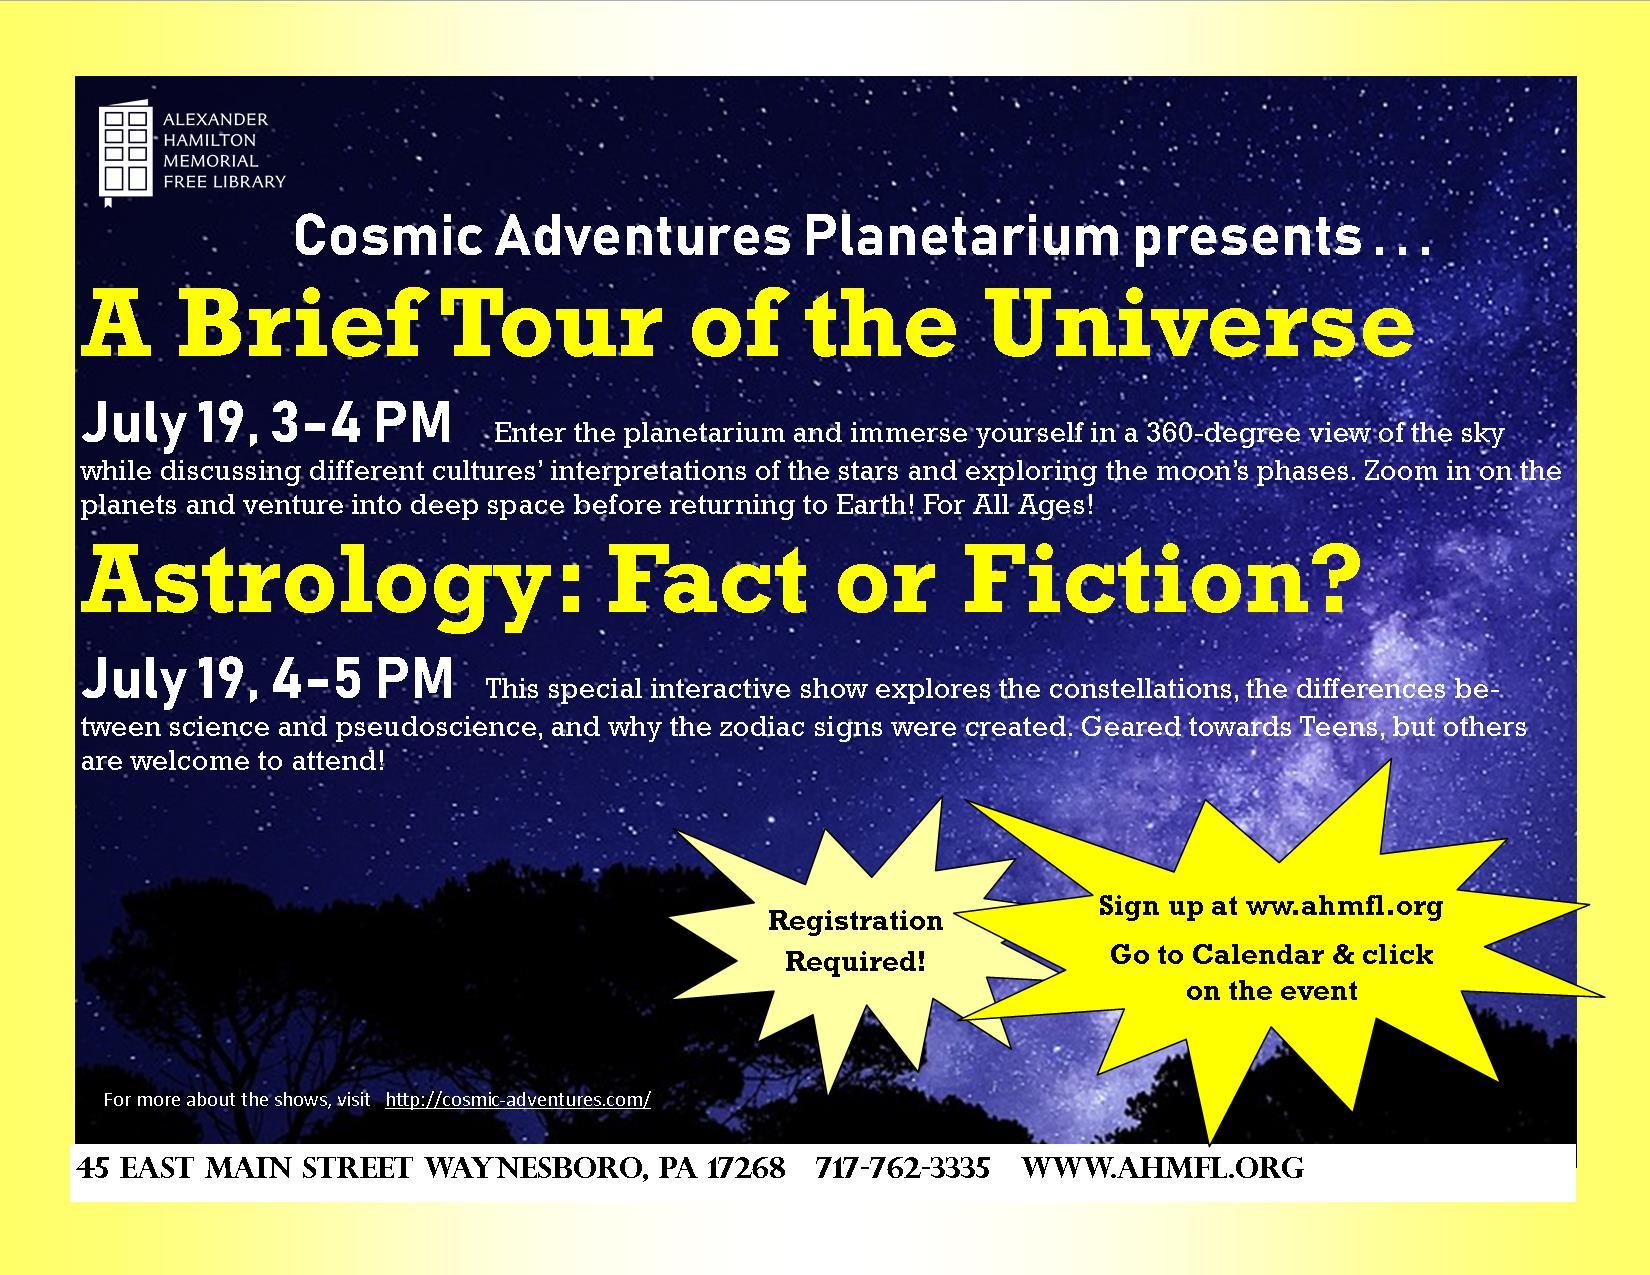 Cosmic Adventures Planetarium flyer.jpg